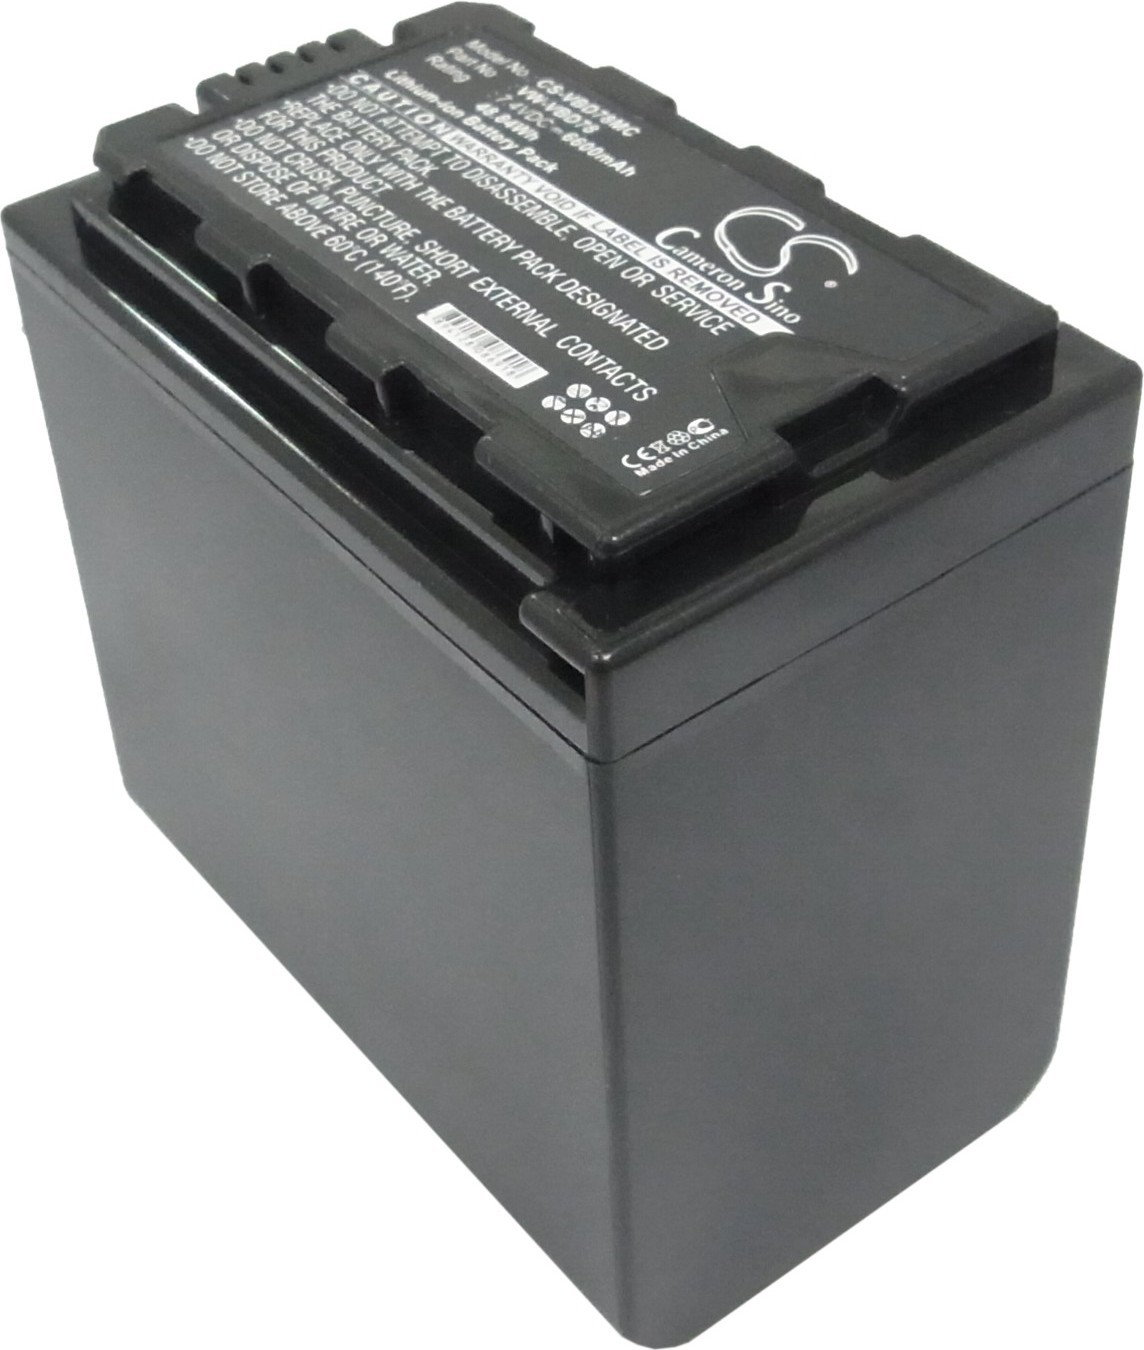 Panasonic AJ-PX298MC / VW-VBD78 6600mAh 48.84Wh Li-Ion 7.4V (Cameron Sino) CS-VB (CS-VBD78MC)